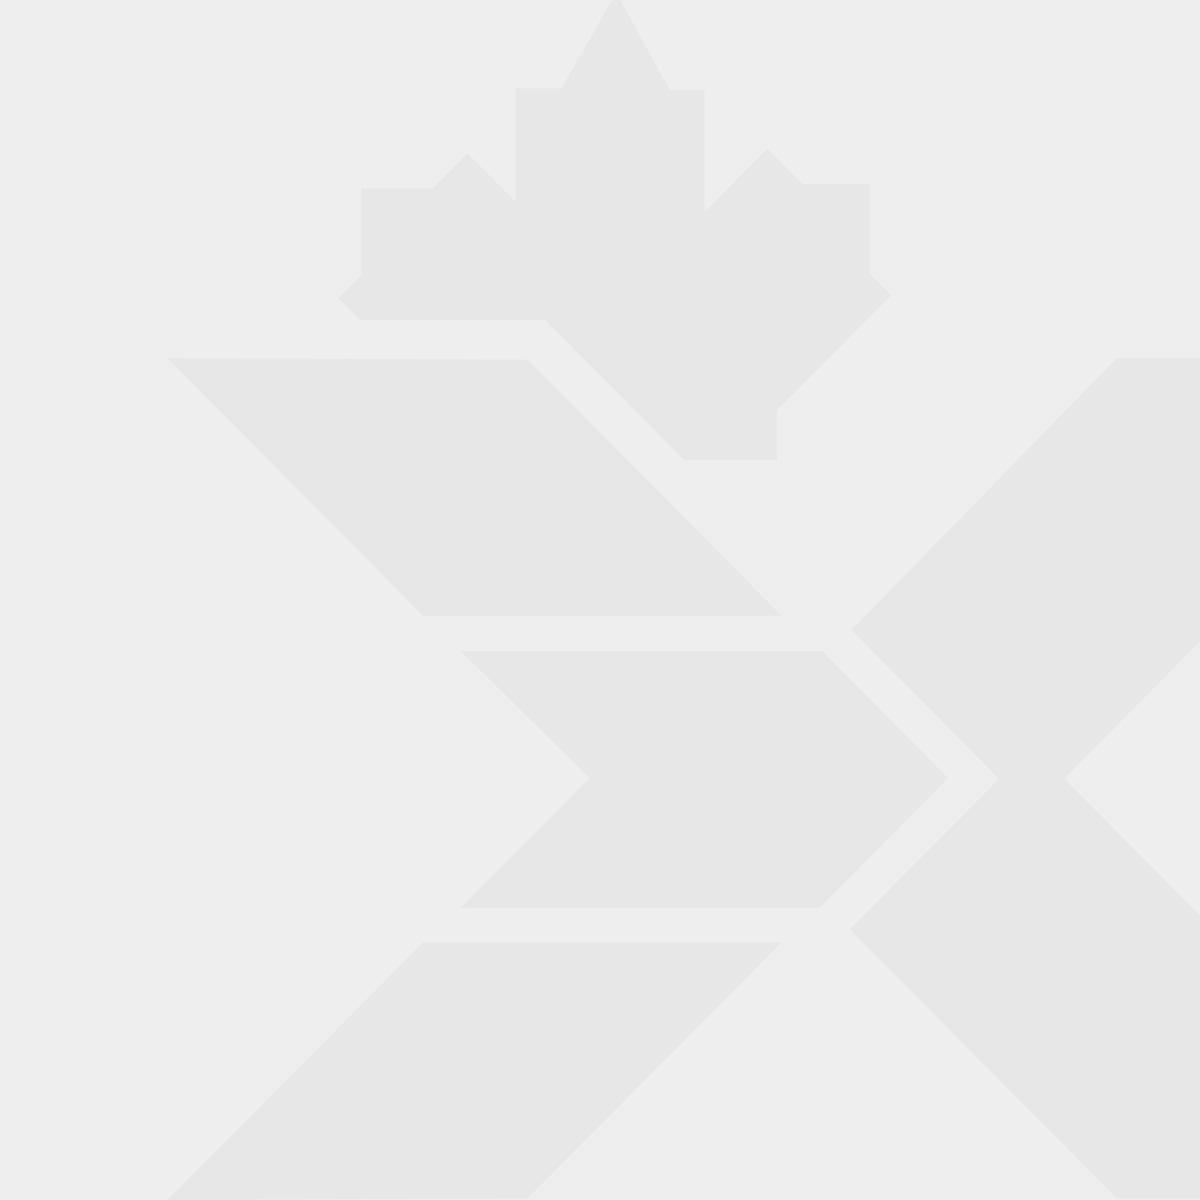 NEST Smoke & Carbon Monoxide Alarm (2nd Gen)